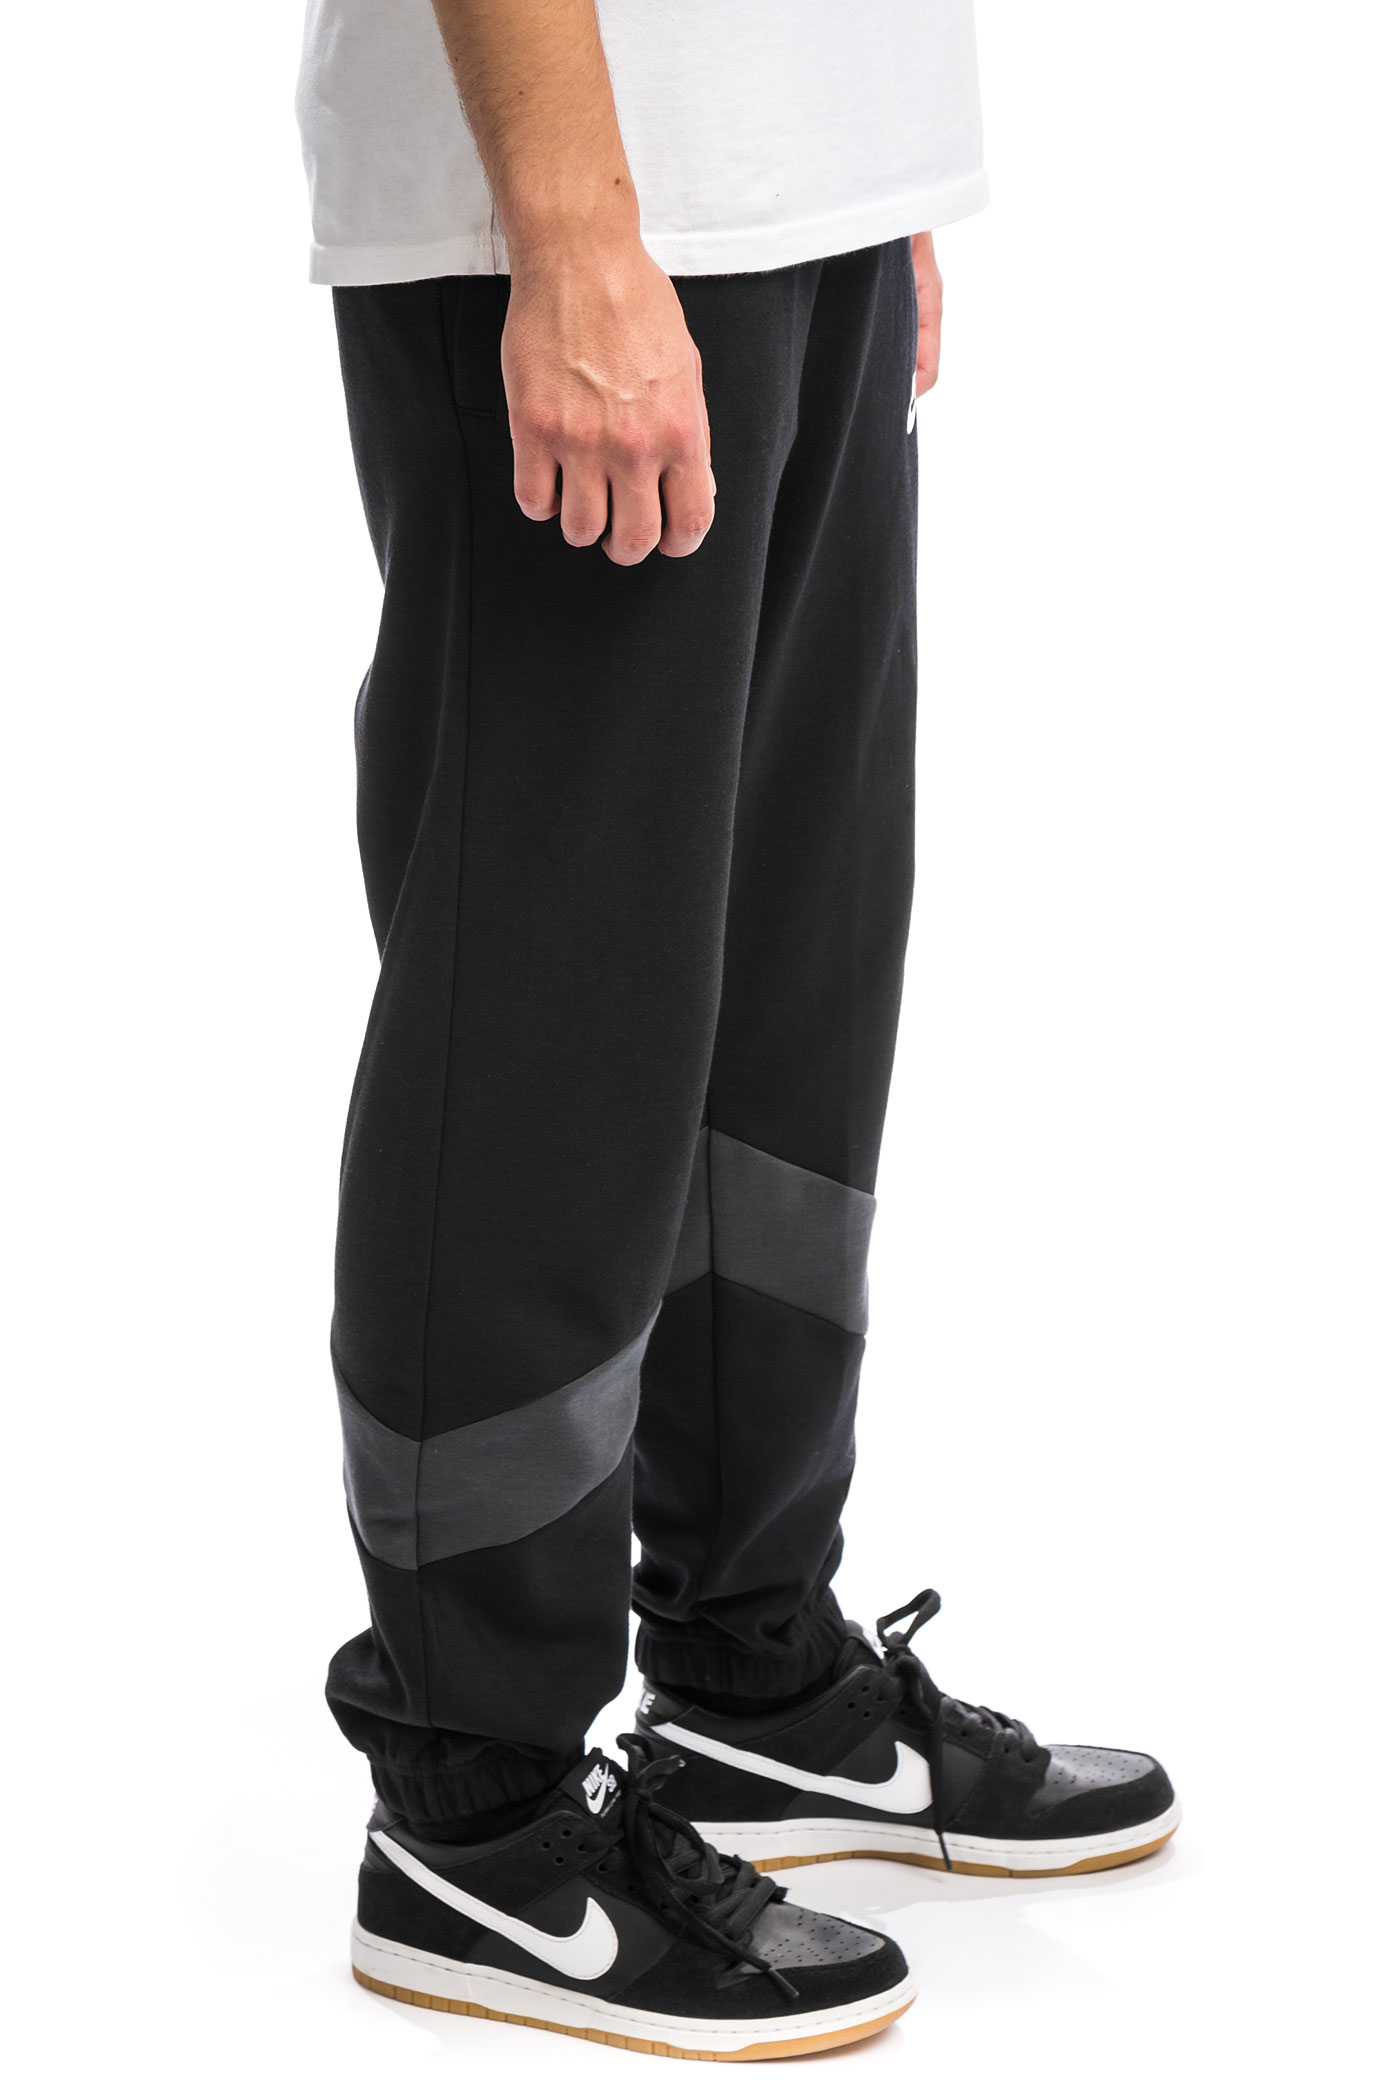 Dry Sb Track Nike Icon Anthracite Pantalonsblack 2WE9YIeDH